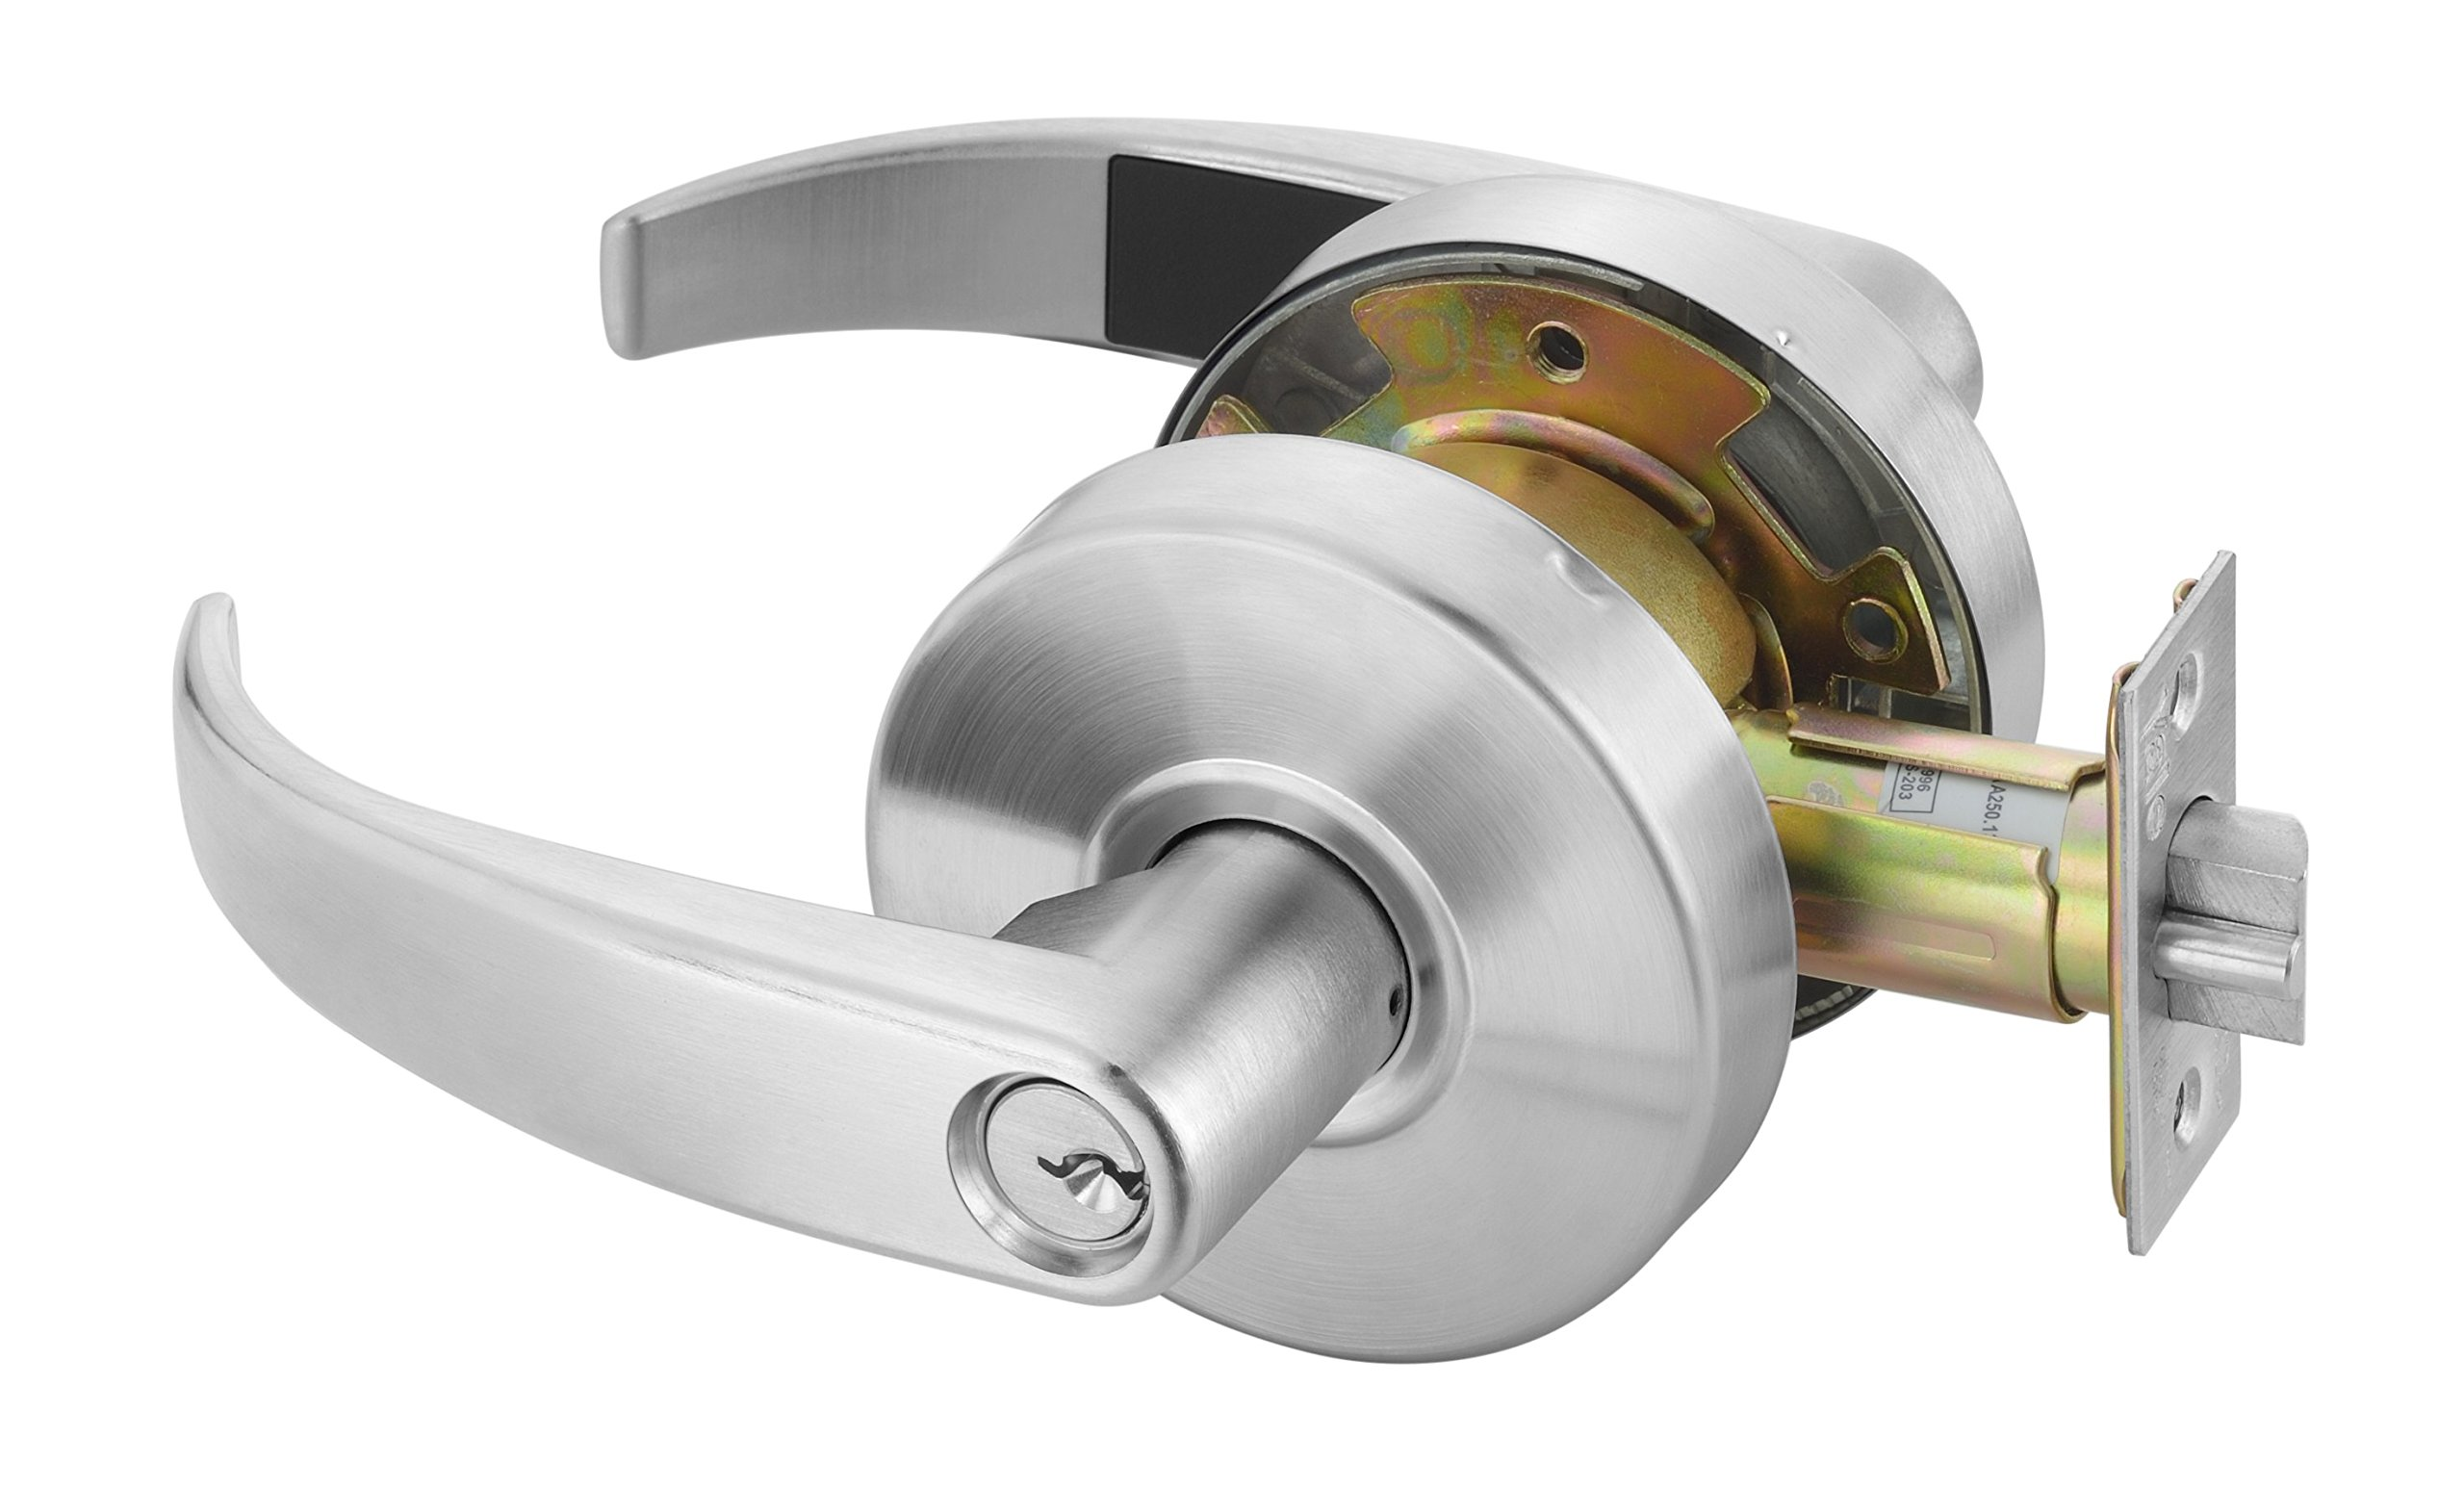 Yale PB4608 LKST 1806 Door Lever Lockset, Cylinder Lock, Entry Lock